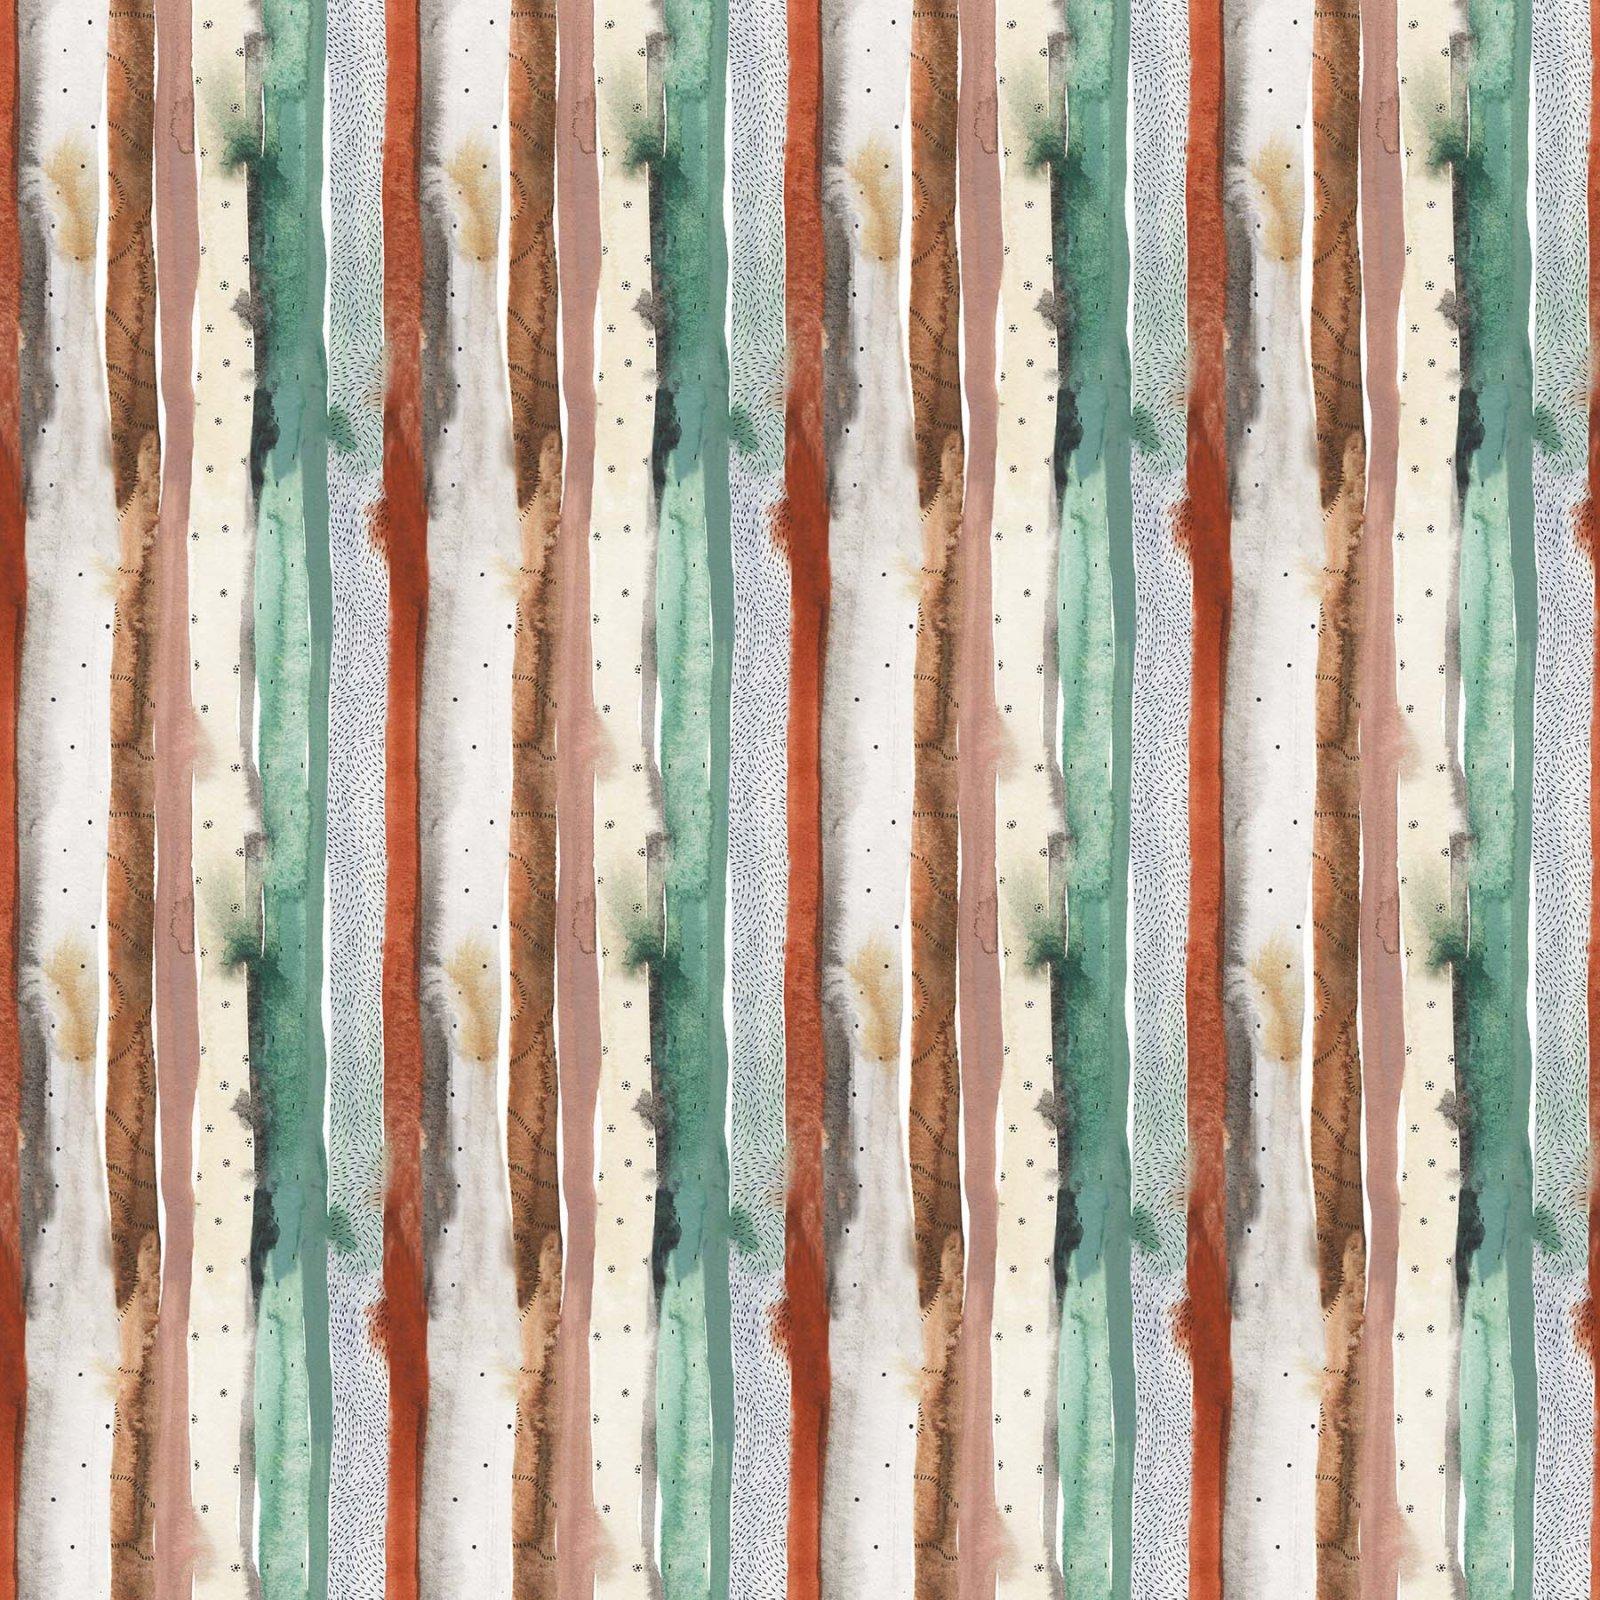 Desert Wilderness - Stripe (Remnant: 1-3/4 yds)